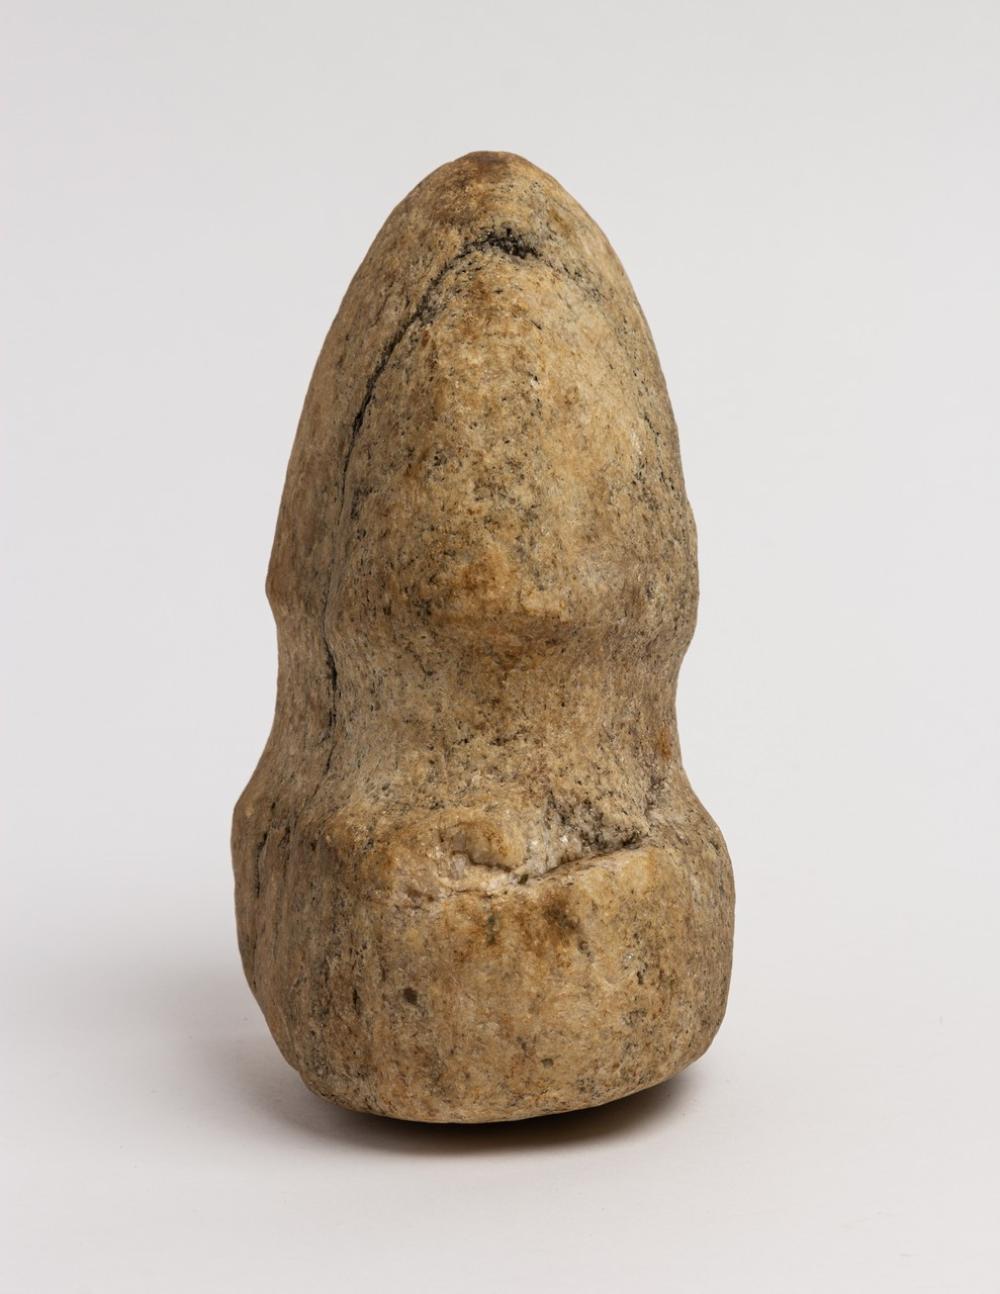 A Northwest Coast stone axe head. 4 1/4 x 6 1/4 x 3 1/4 in. (10.8 x 15.9 x 8.2 cm)